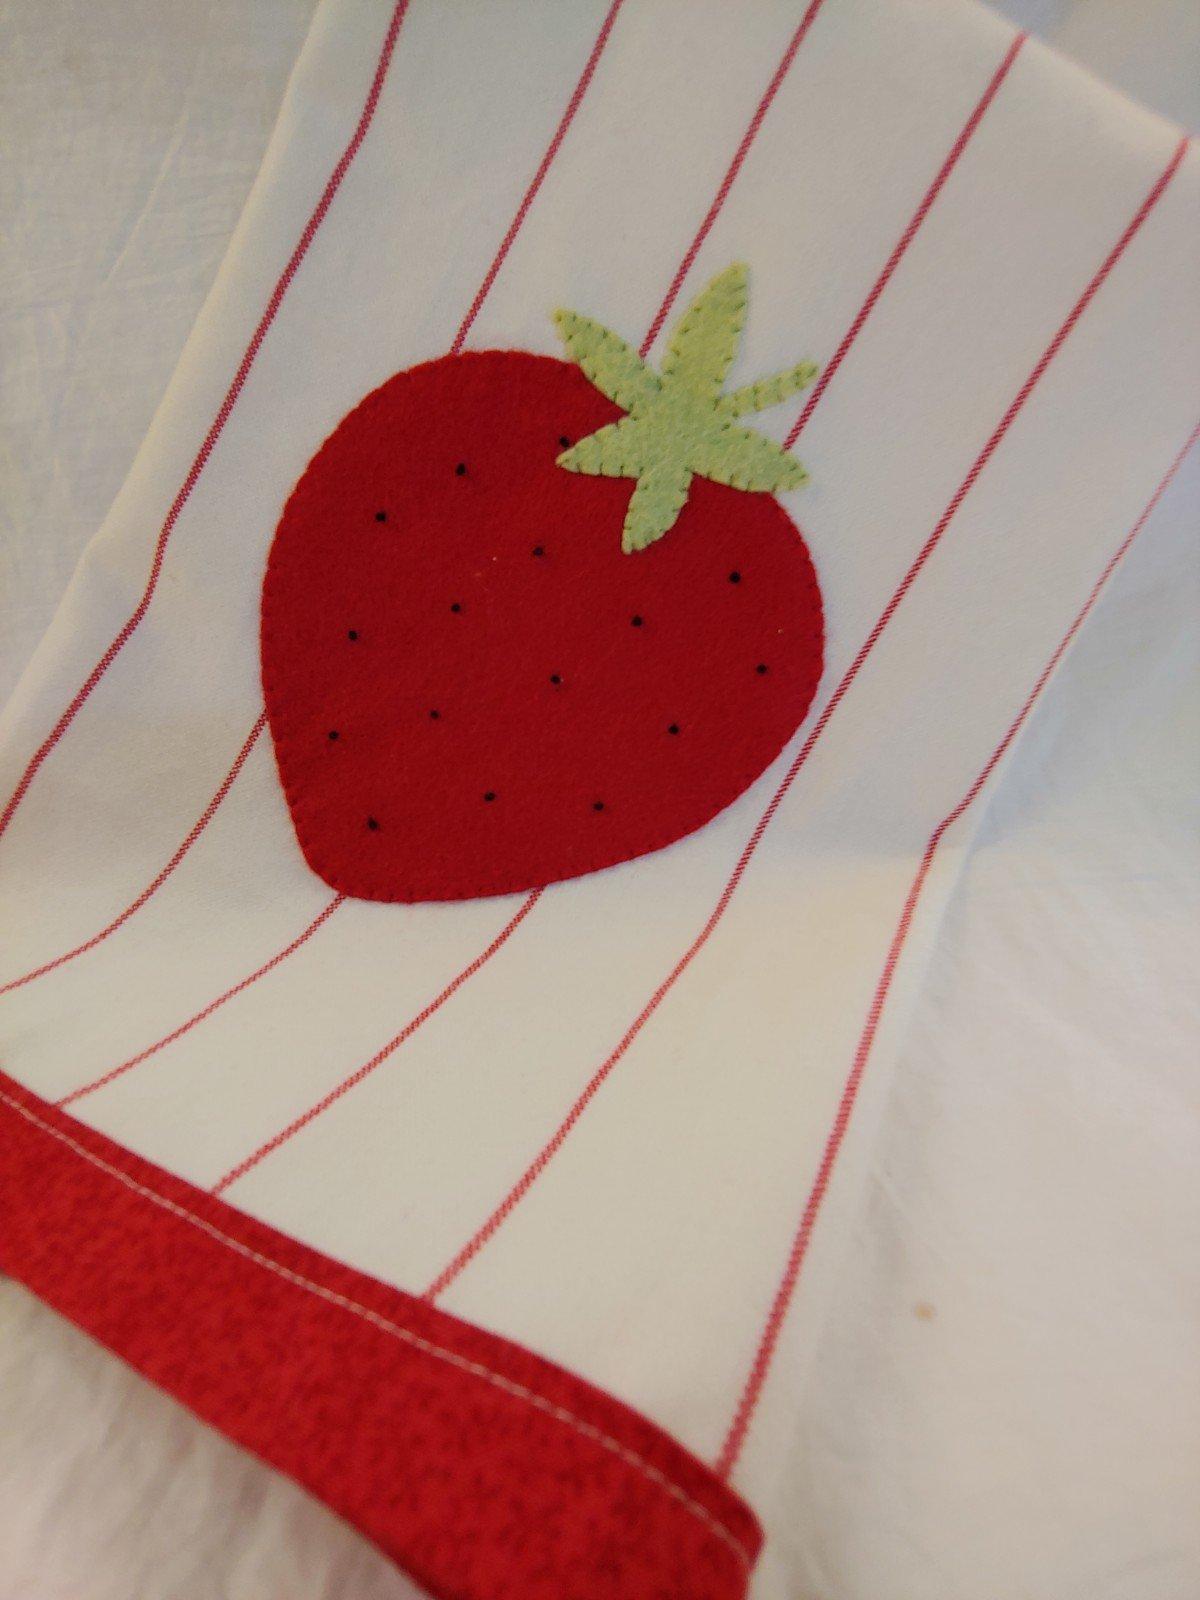 Wool Applique Tea Towel Kit - Strawberry